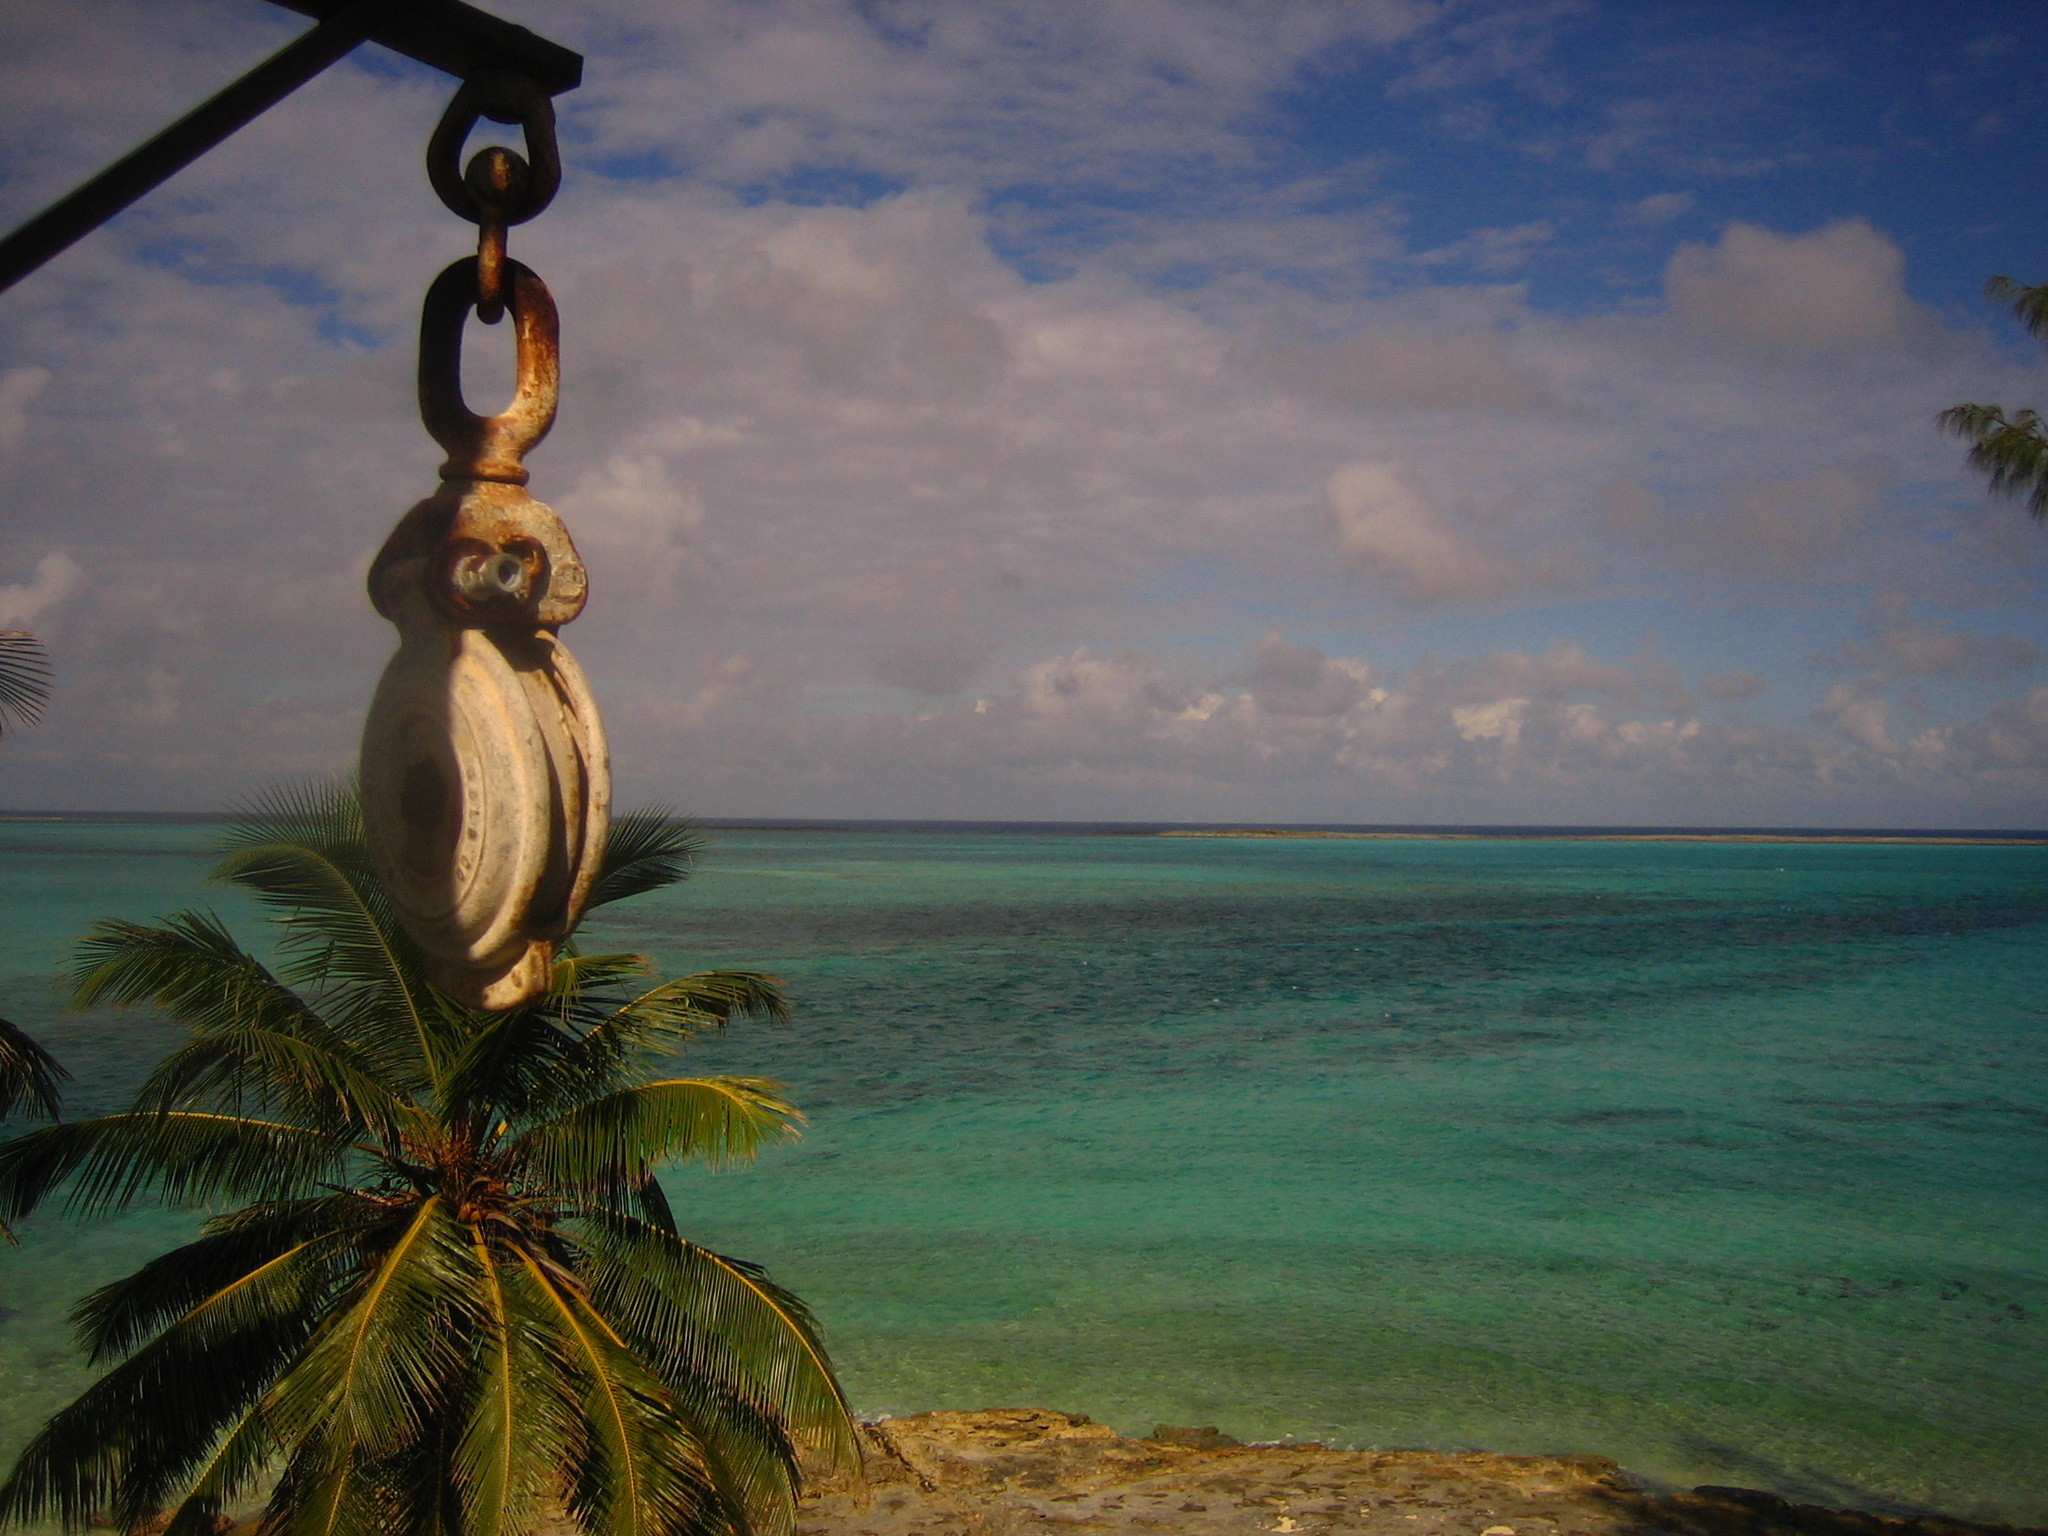 Outer Islands, Bahamas